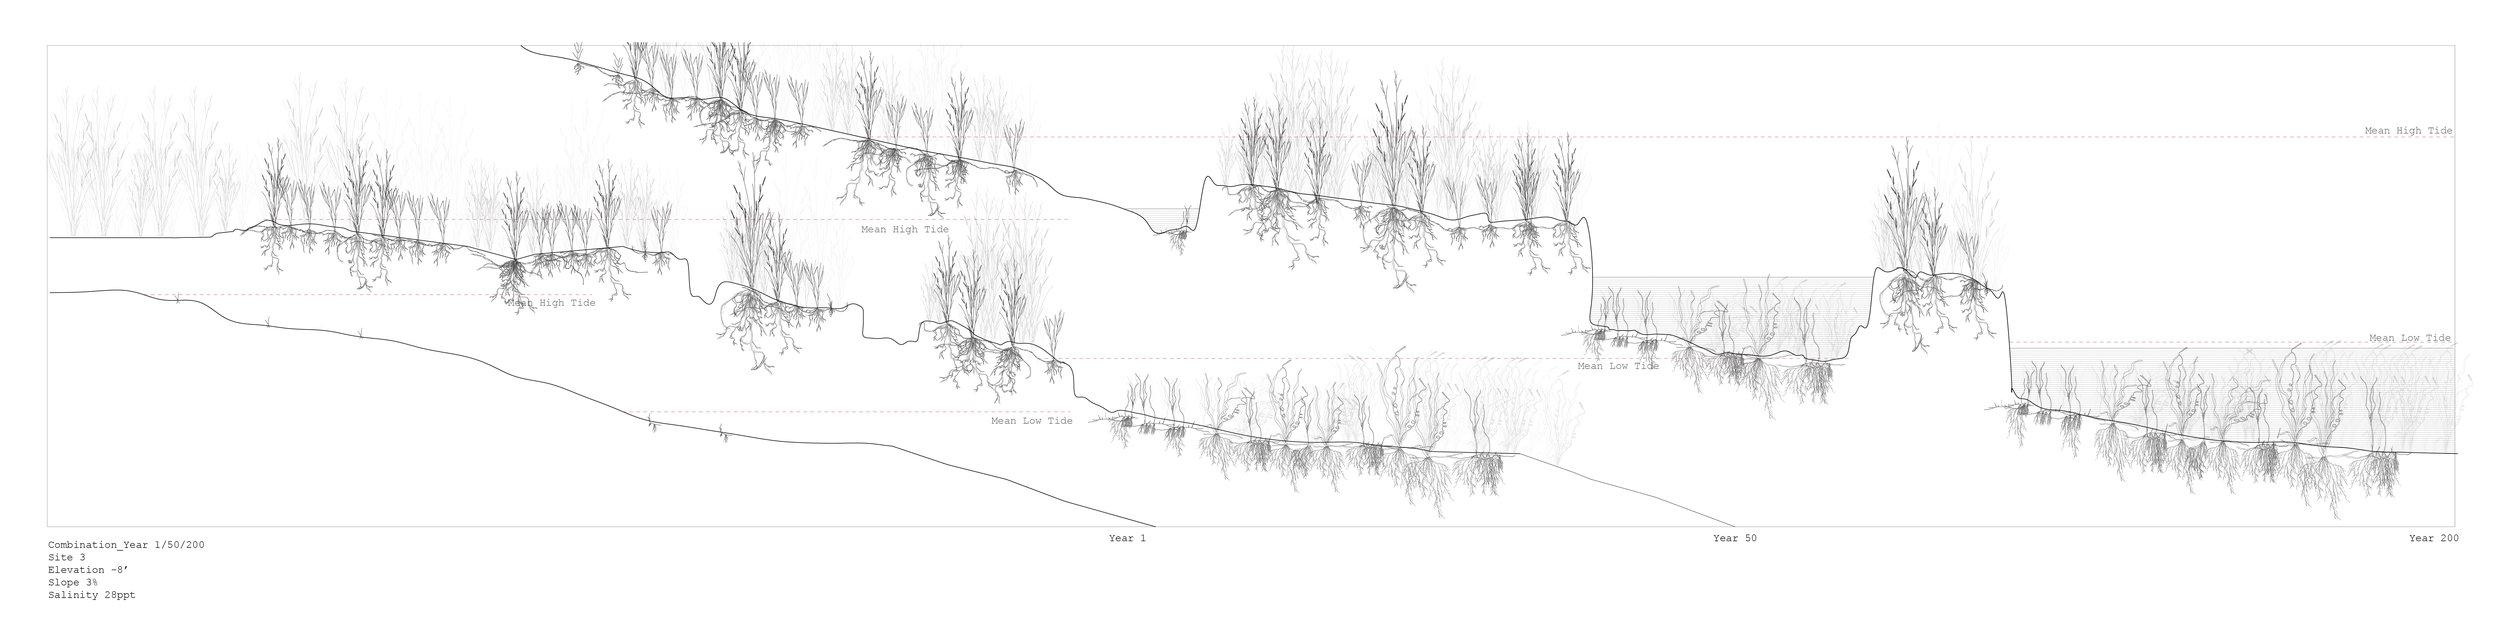 Spartina + Zostera, Growth Analyses